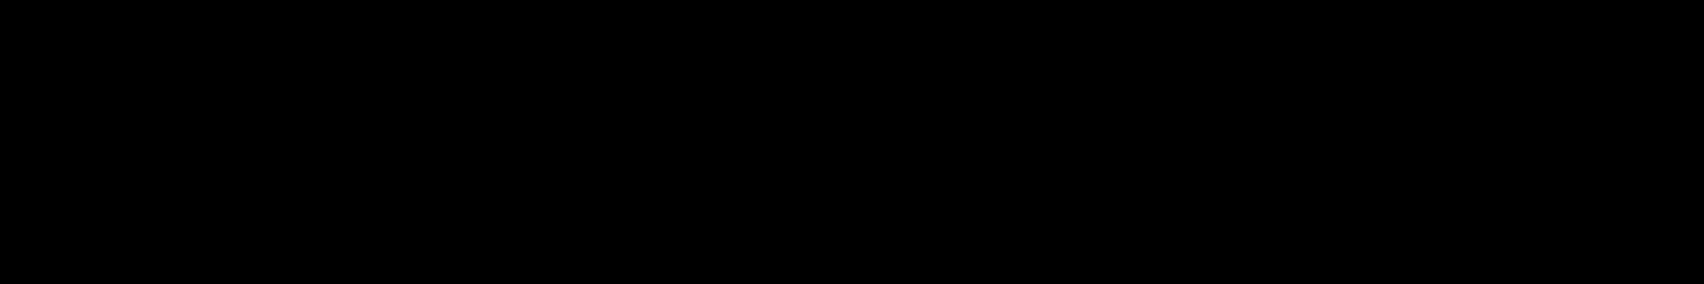 Logo Avery Denninson / Monarch